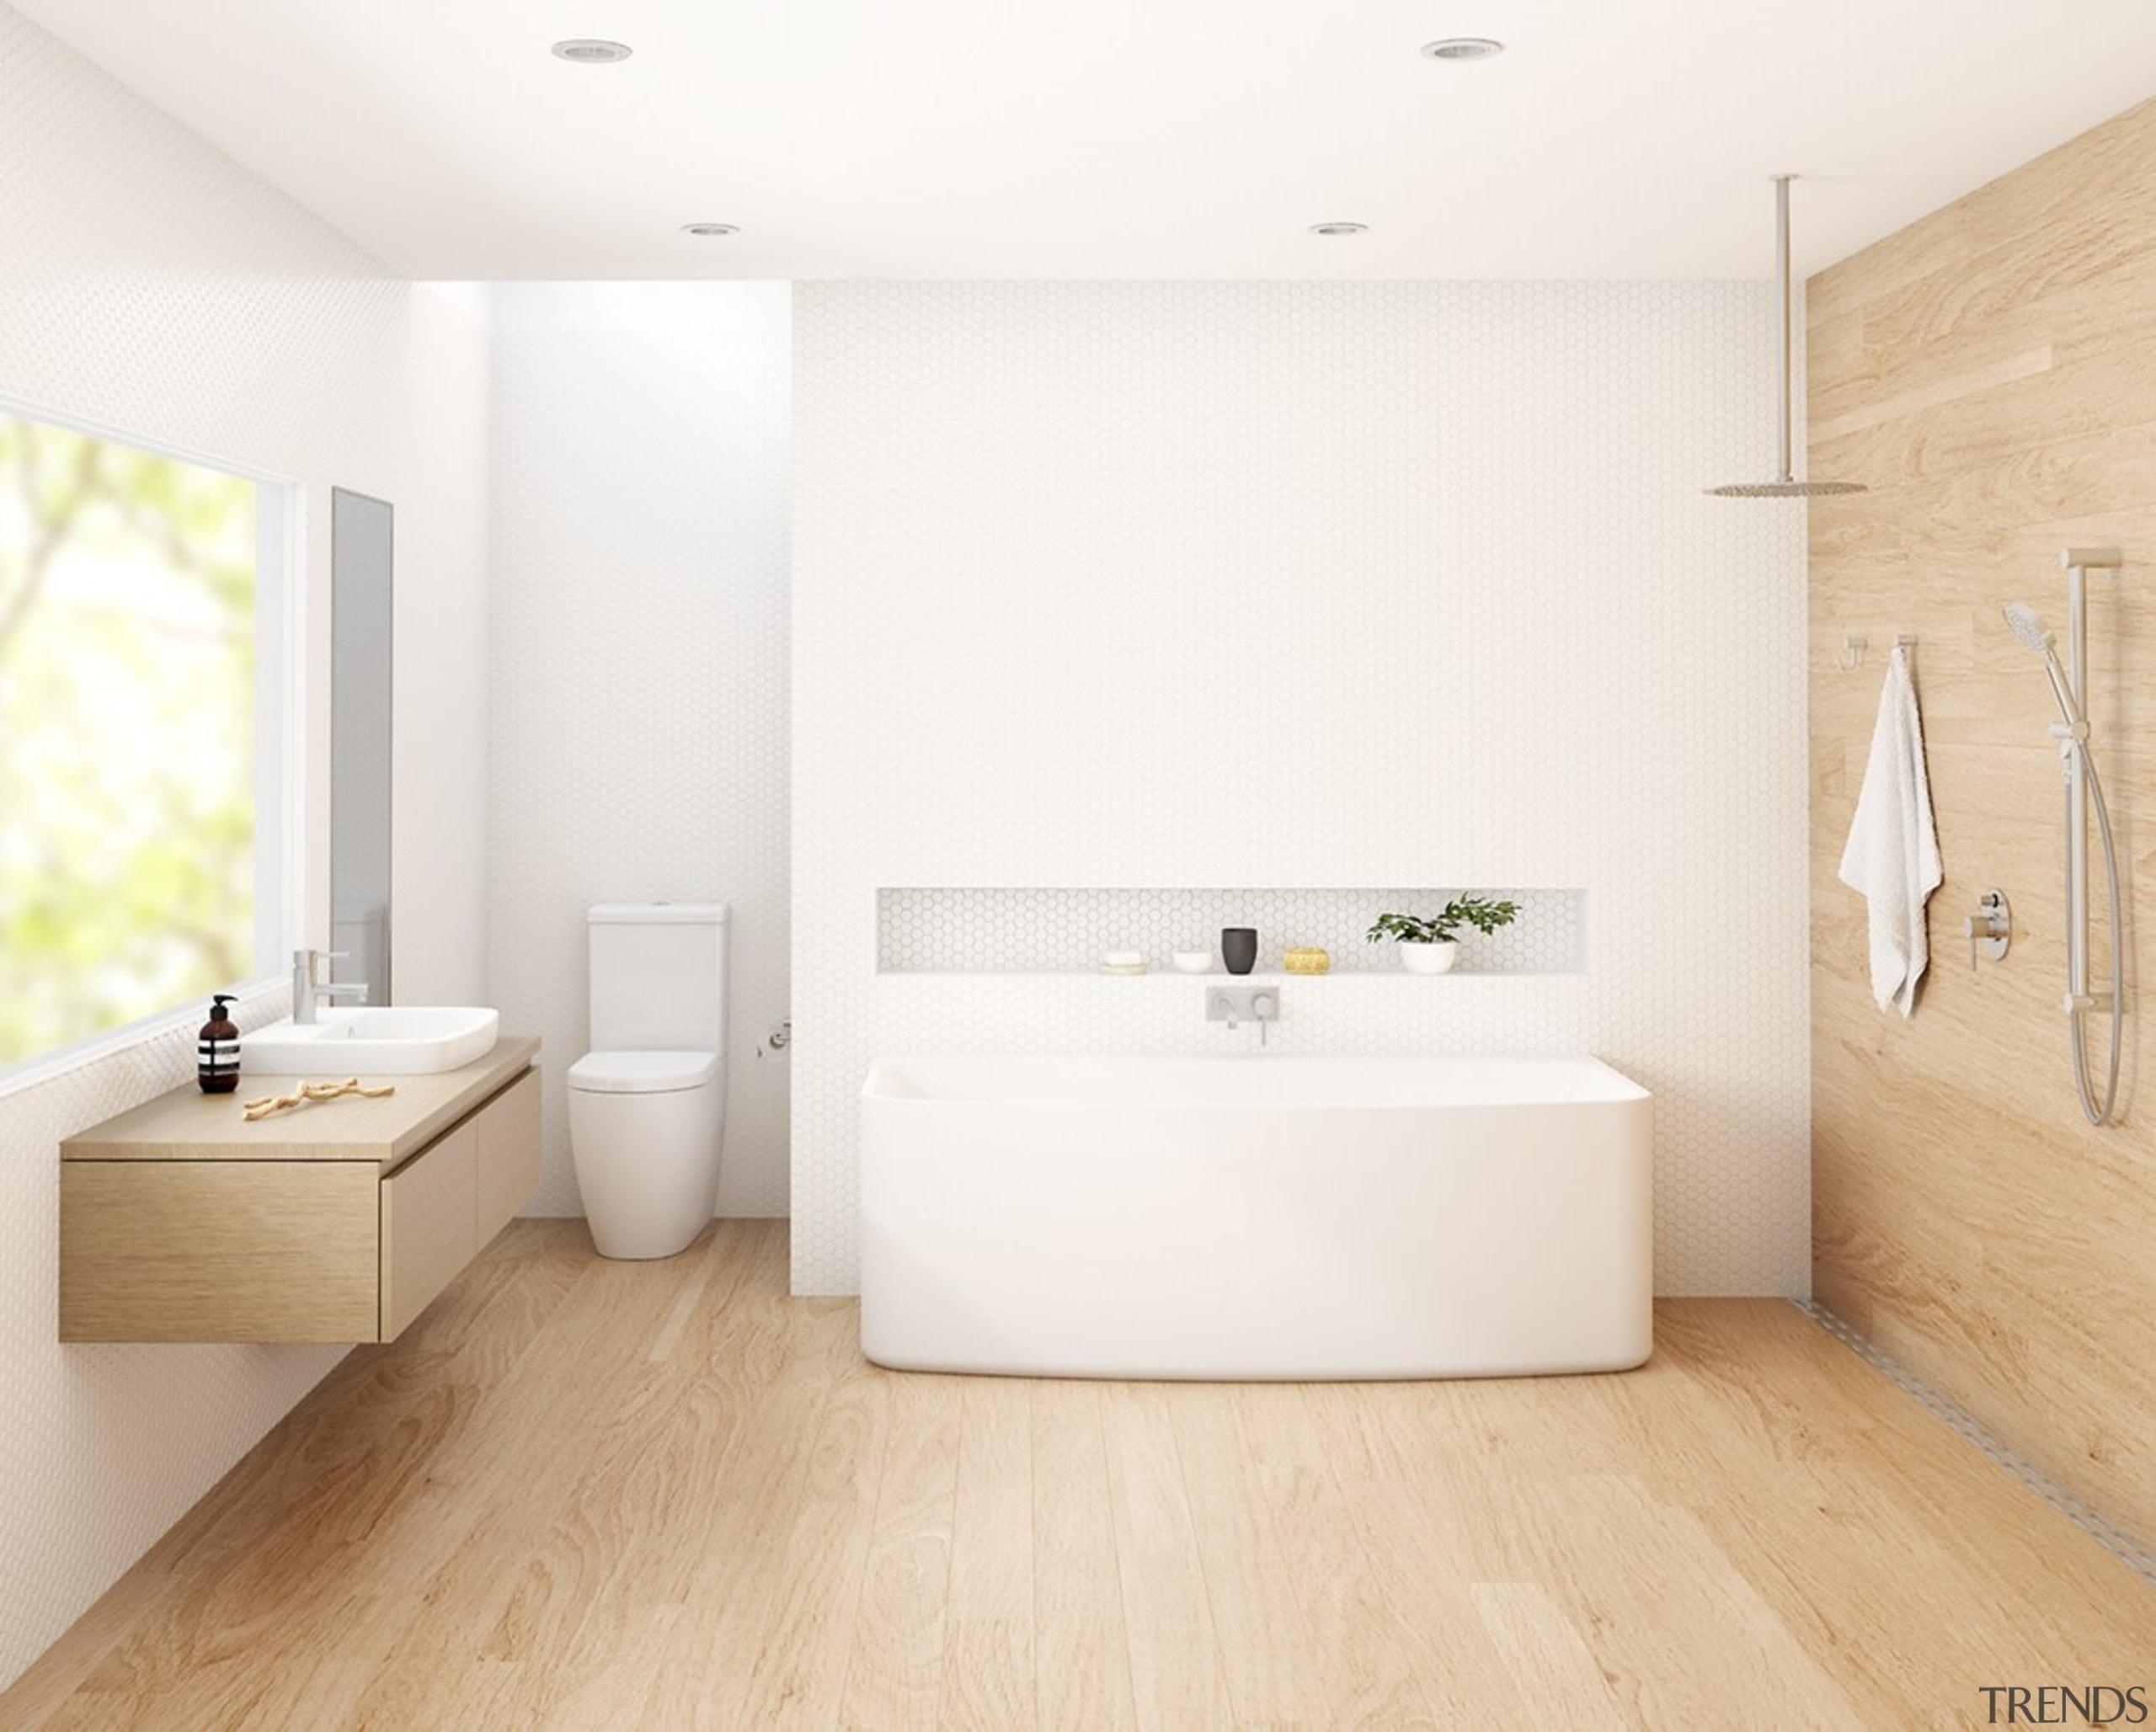 Caroma Urbane - Caroma Urbane - architecture | architecture, bathroom, bathroom sink, floor, flooring, interior design, laminate flooring, plumbing fixture, room, sink, tap, tile, wall, wood flooring, white